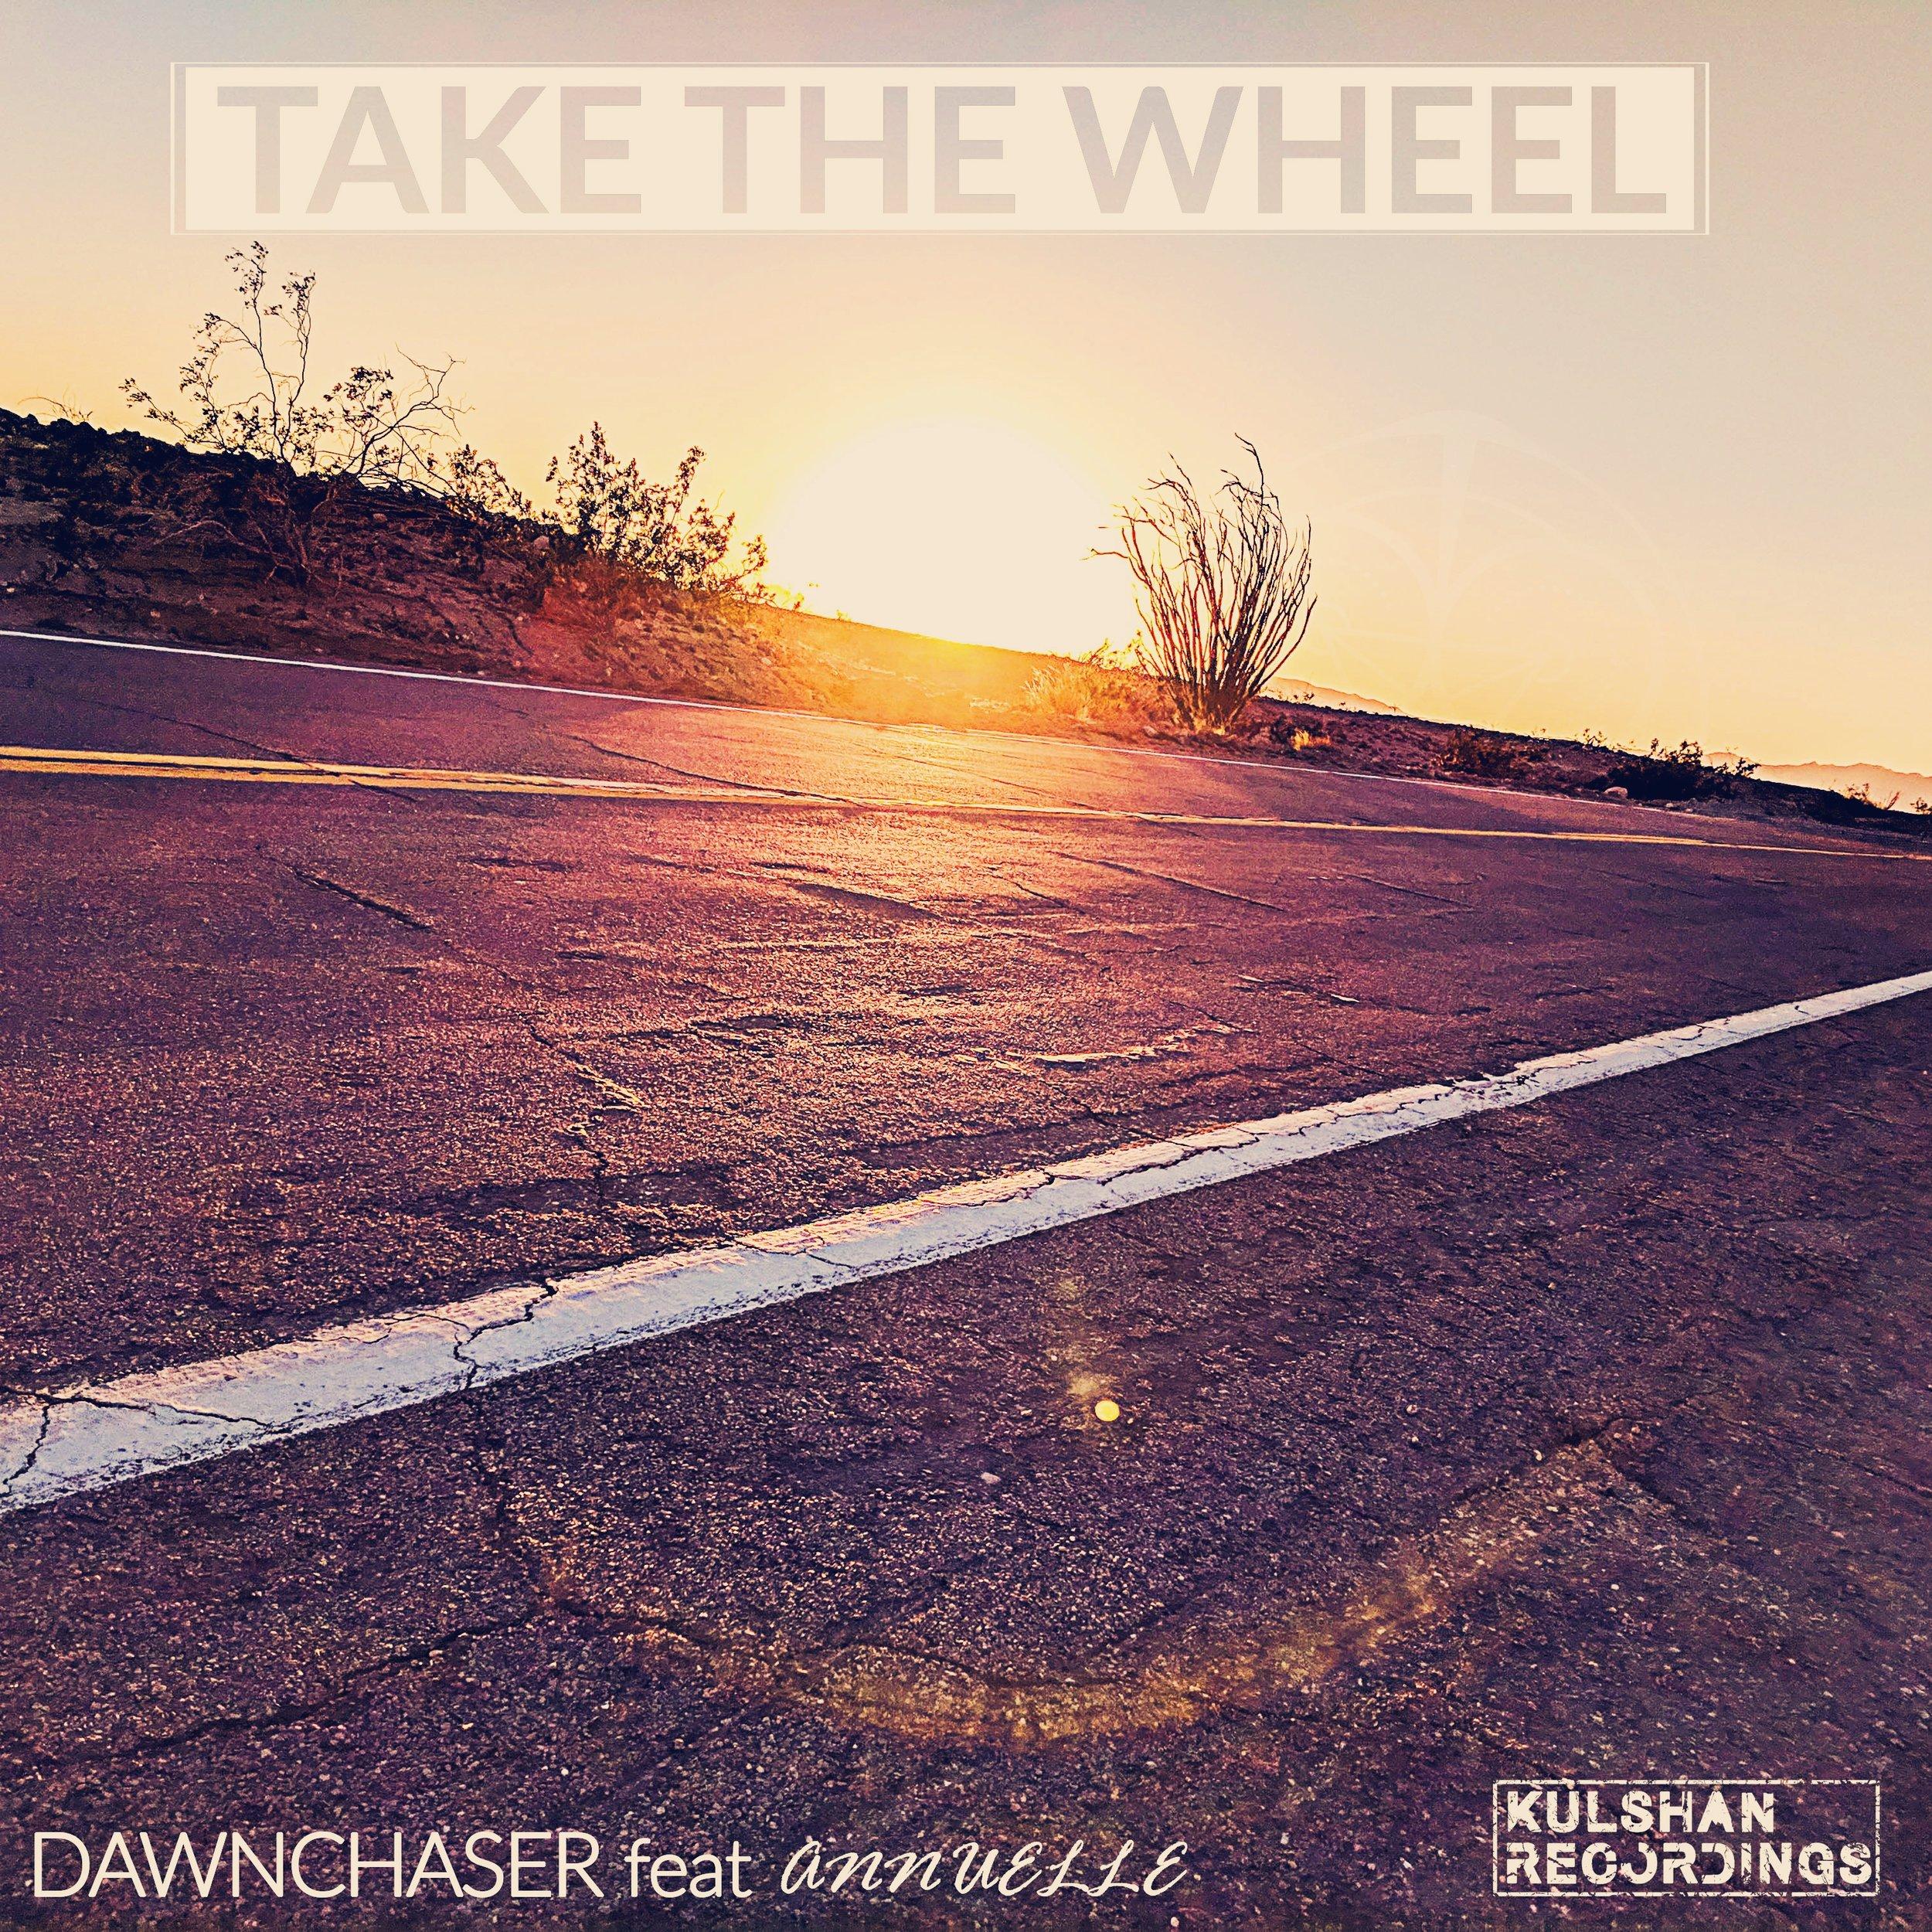 Take The Wheel cover - Copy (1).JPG